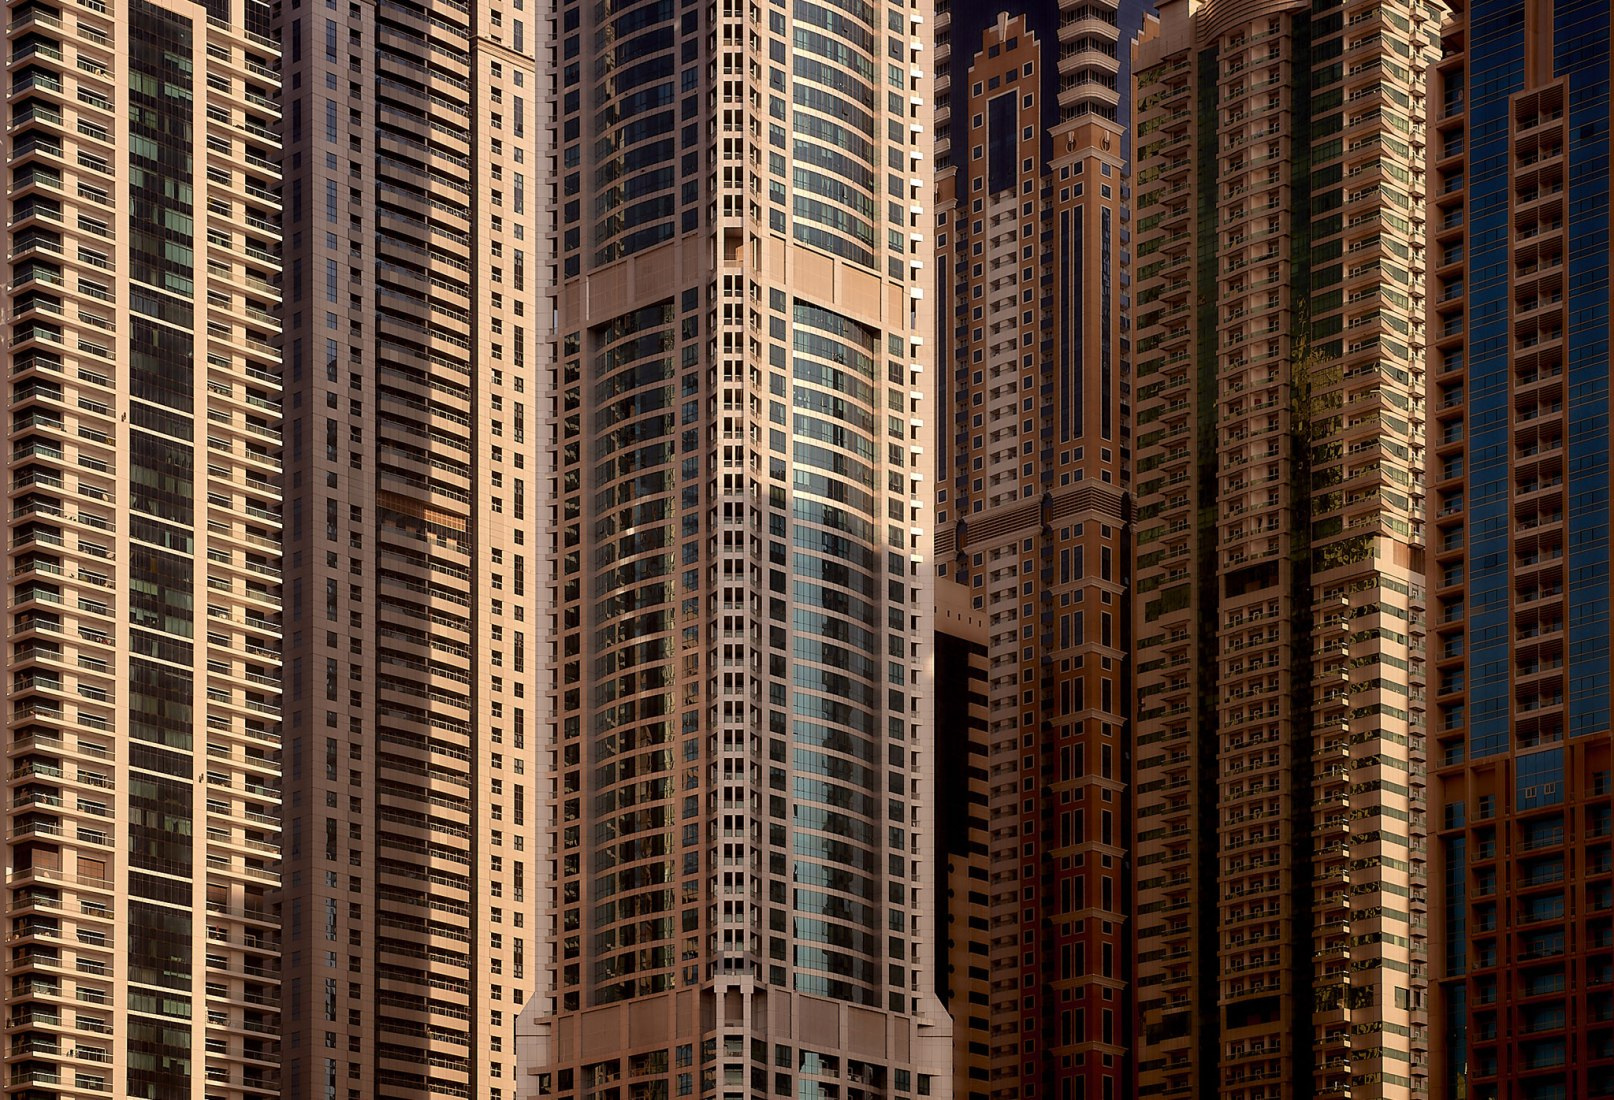 """Architecture of Density"" por Manuel Álvarez, como tributo a la obra de Michael Wolf. Fotografía de Manuel Álvarez."